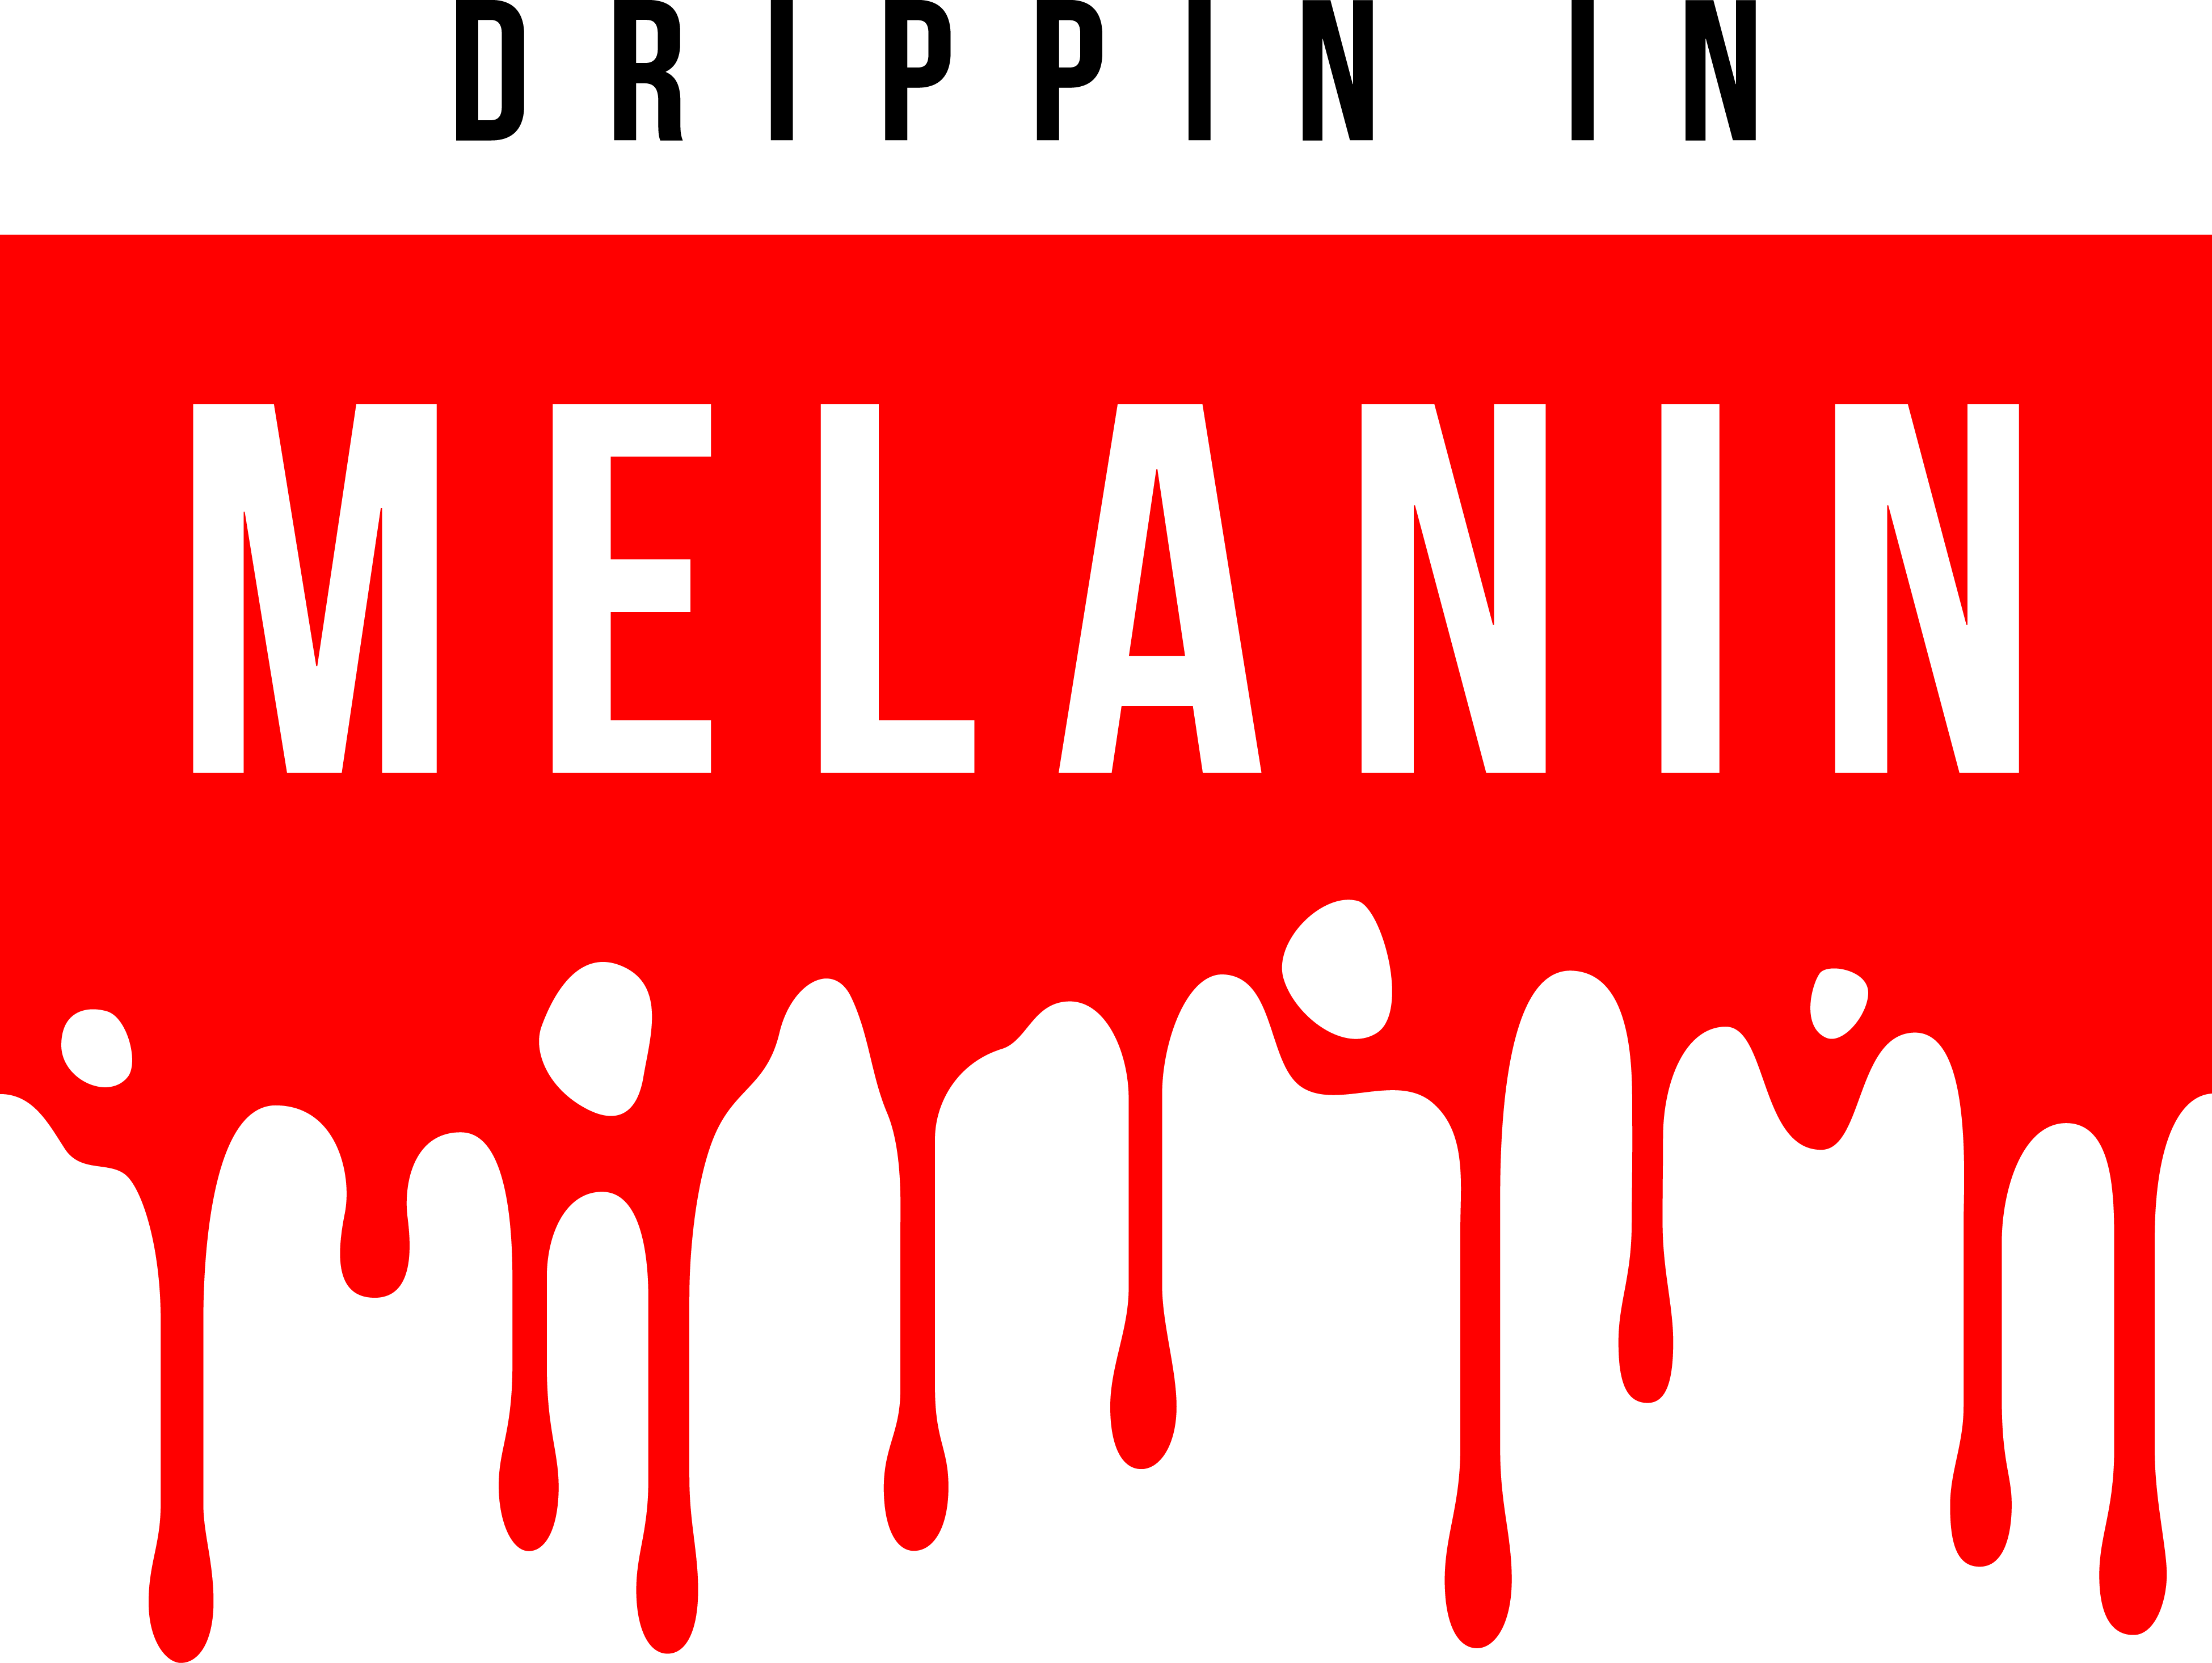 Drippin in melanin 2